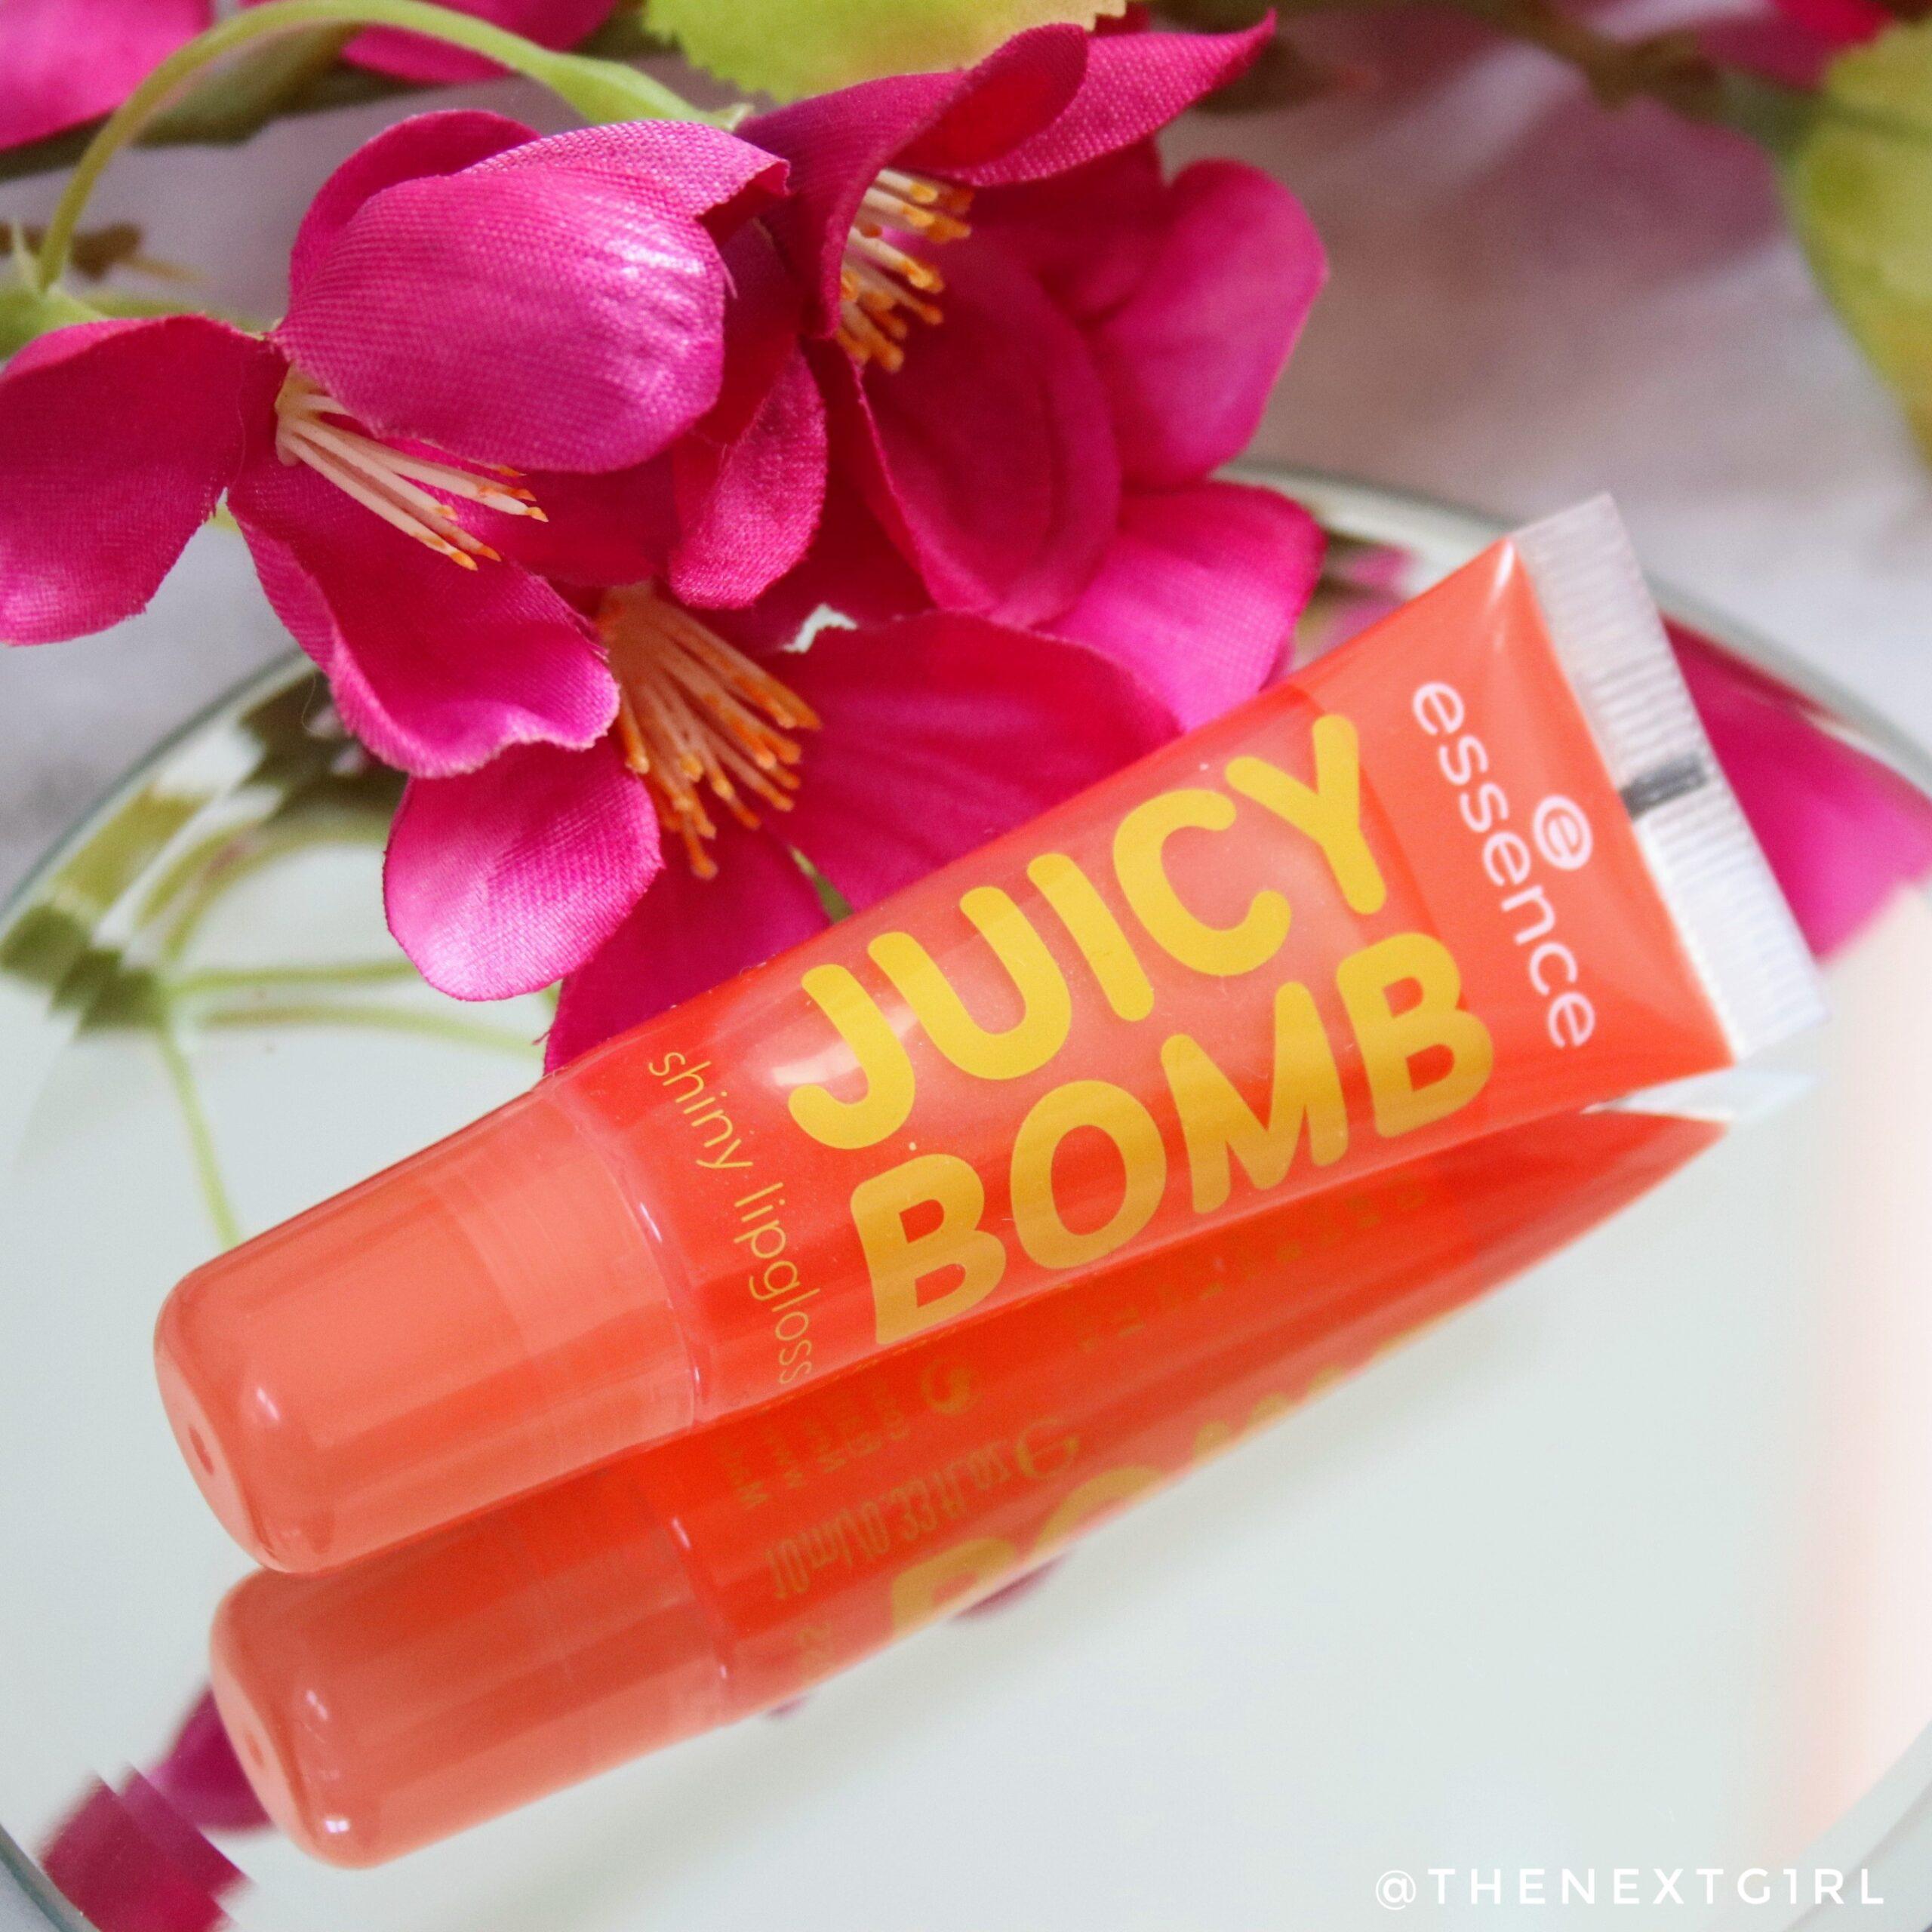 Review: Essence Juicy Bomb shiny lipgloss